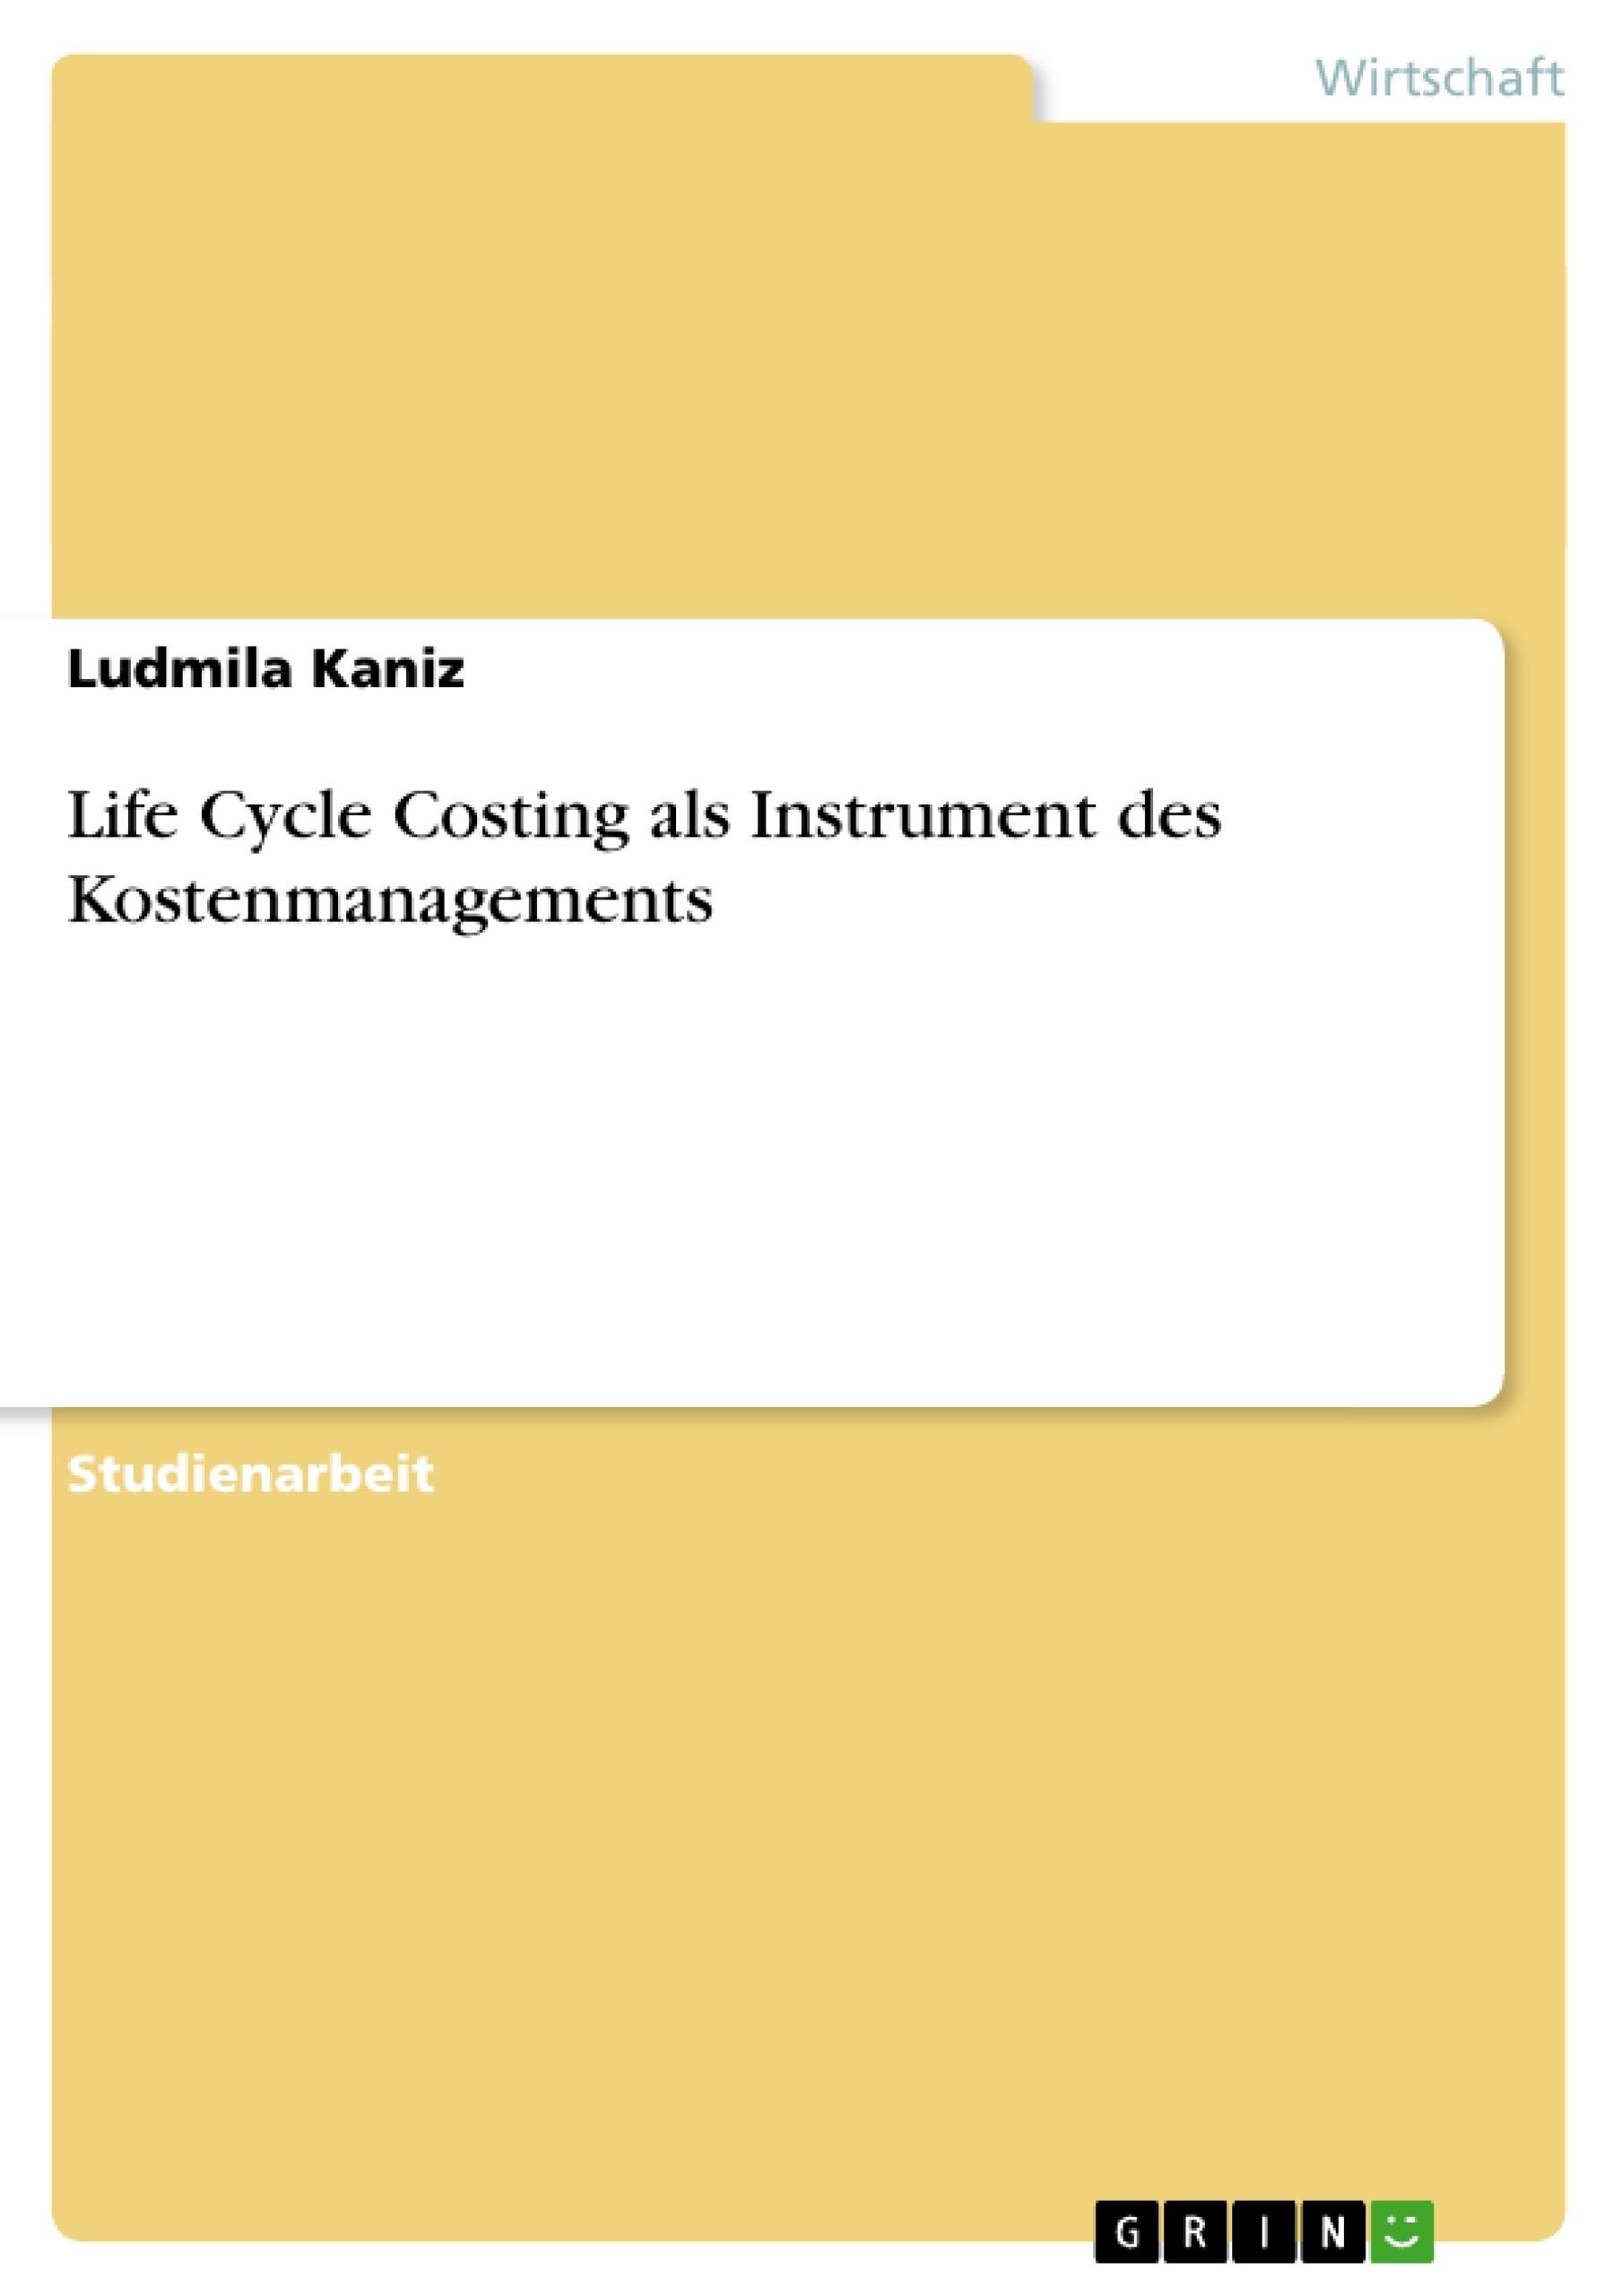 Titel: Life Cycle Costing als Instrument des Kostenmanagements